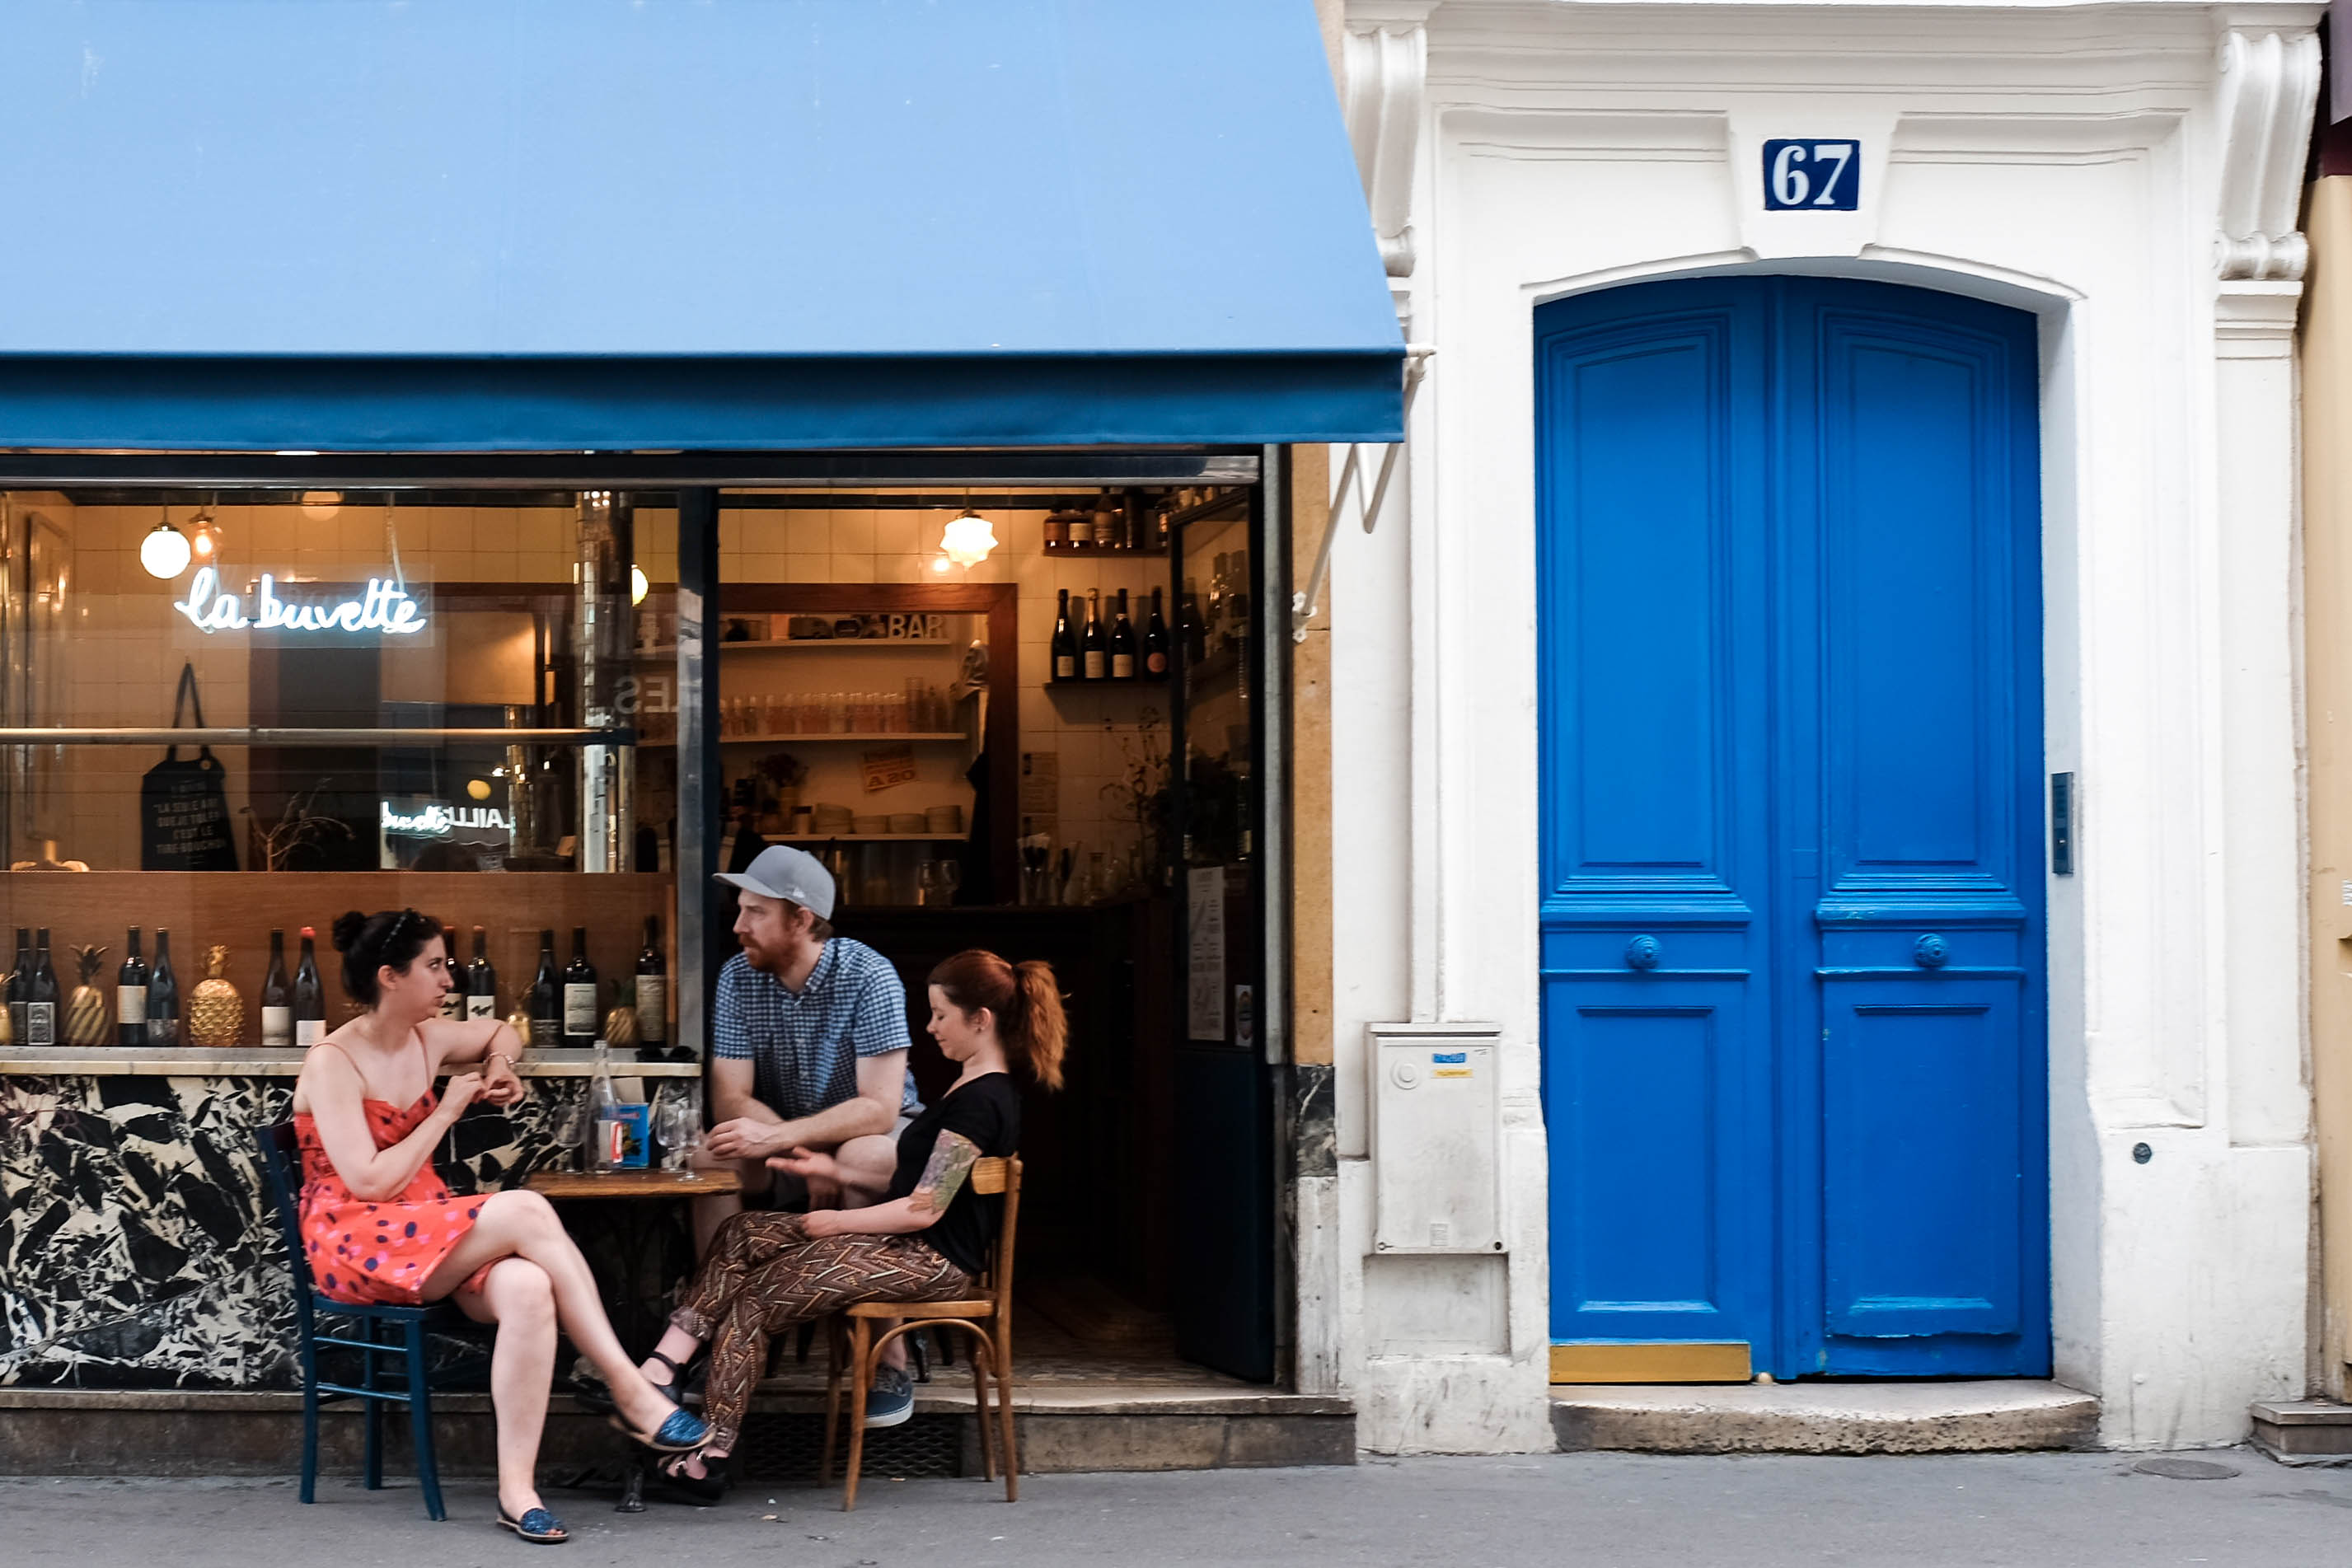 Three people sit at a sidewalk table outside La Buvette wine bar in Paris.